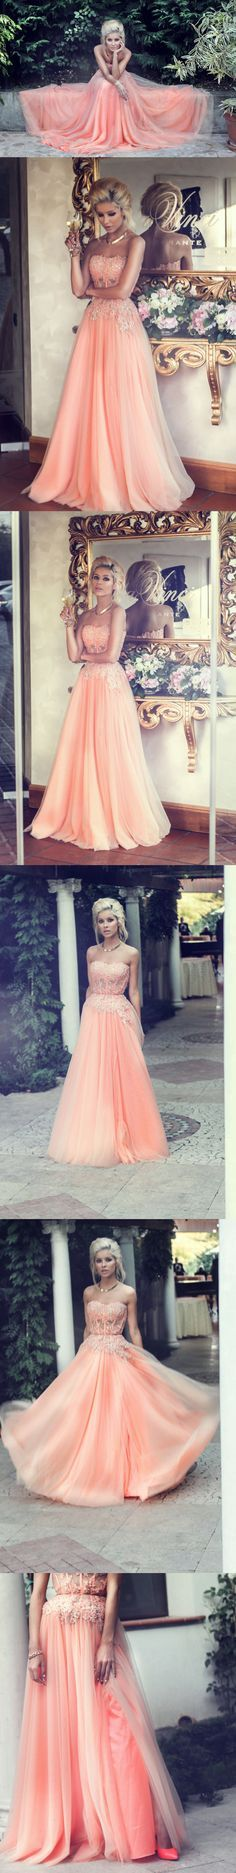 blush prom dress,tulle prom dresses,prom dresses,long prom dress,pink wedding dress,vintage wedding dress,strapless prom dress,prom gowns,evening gowns,evening gown,new arrival dresses